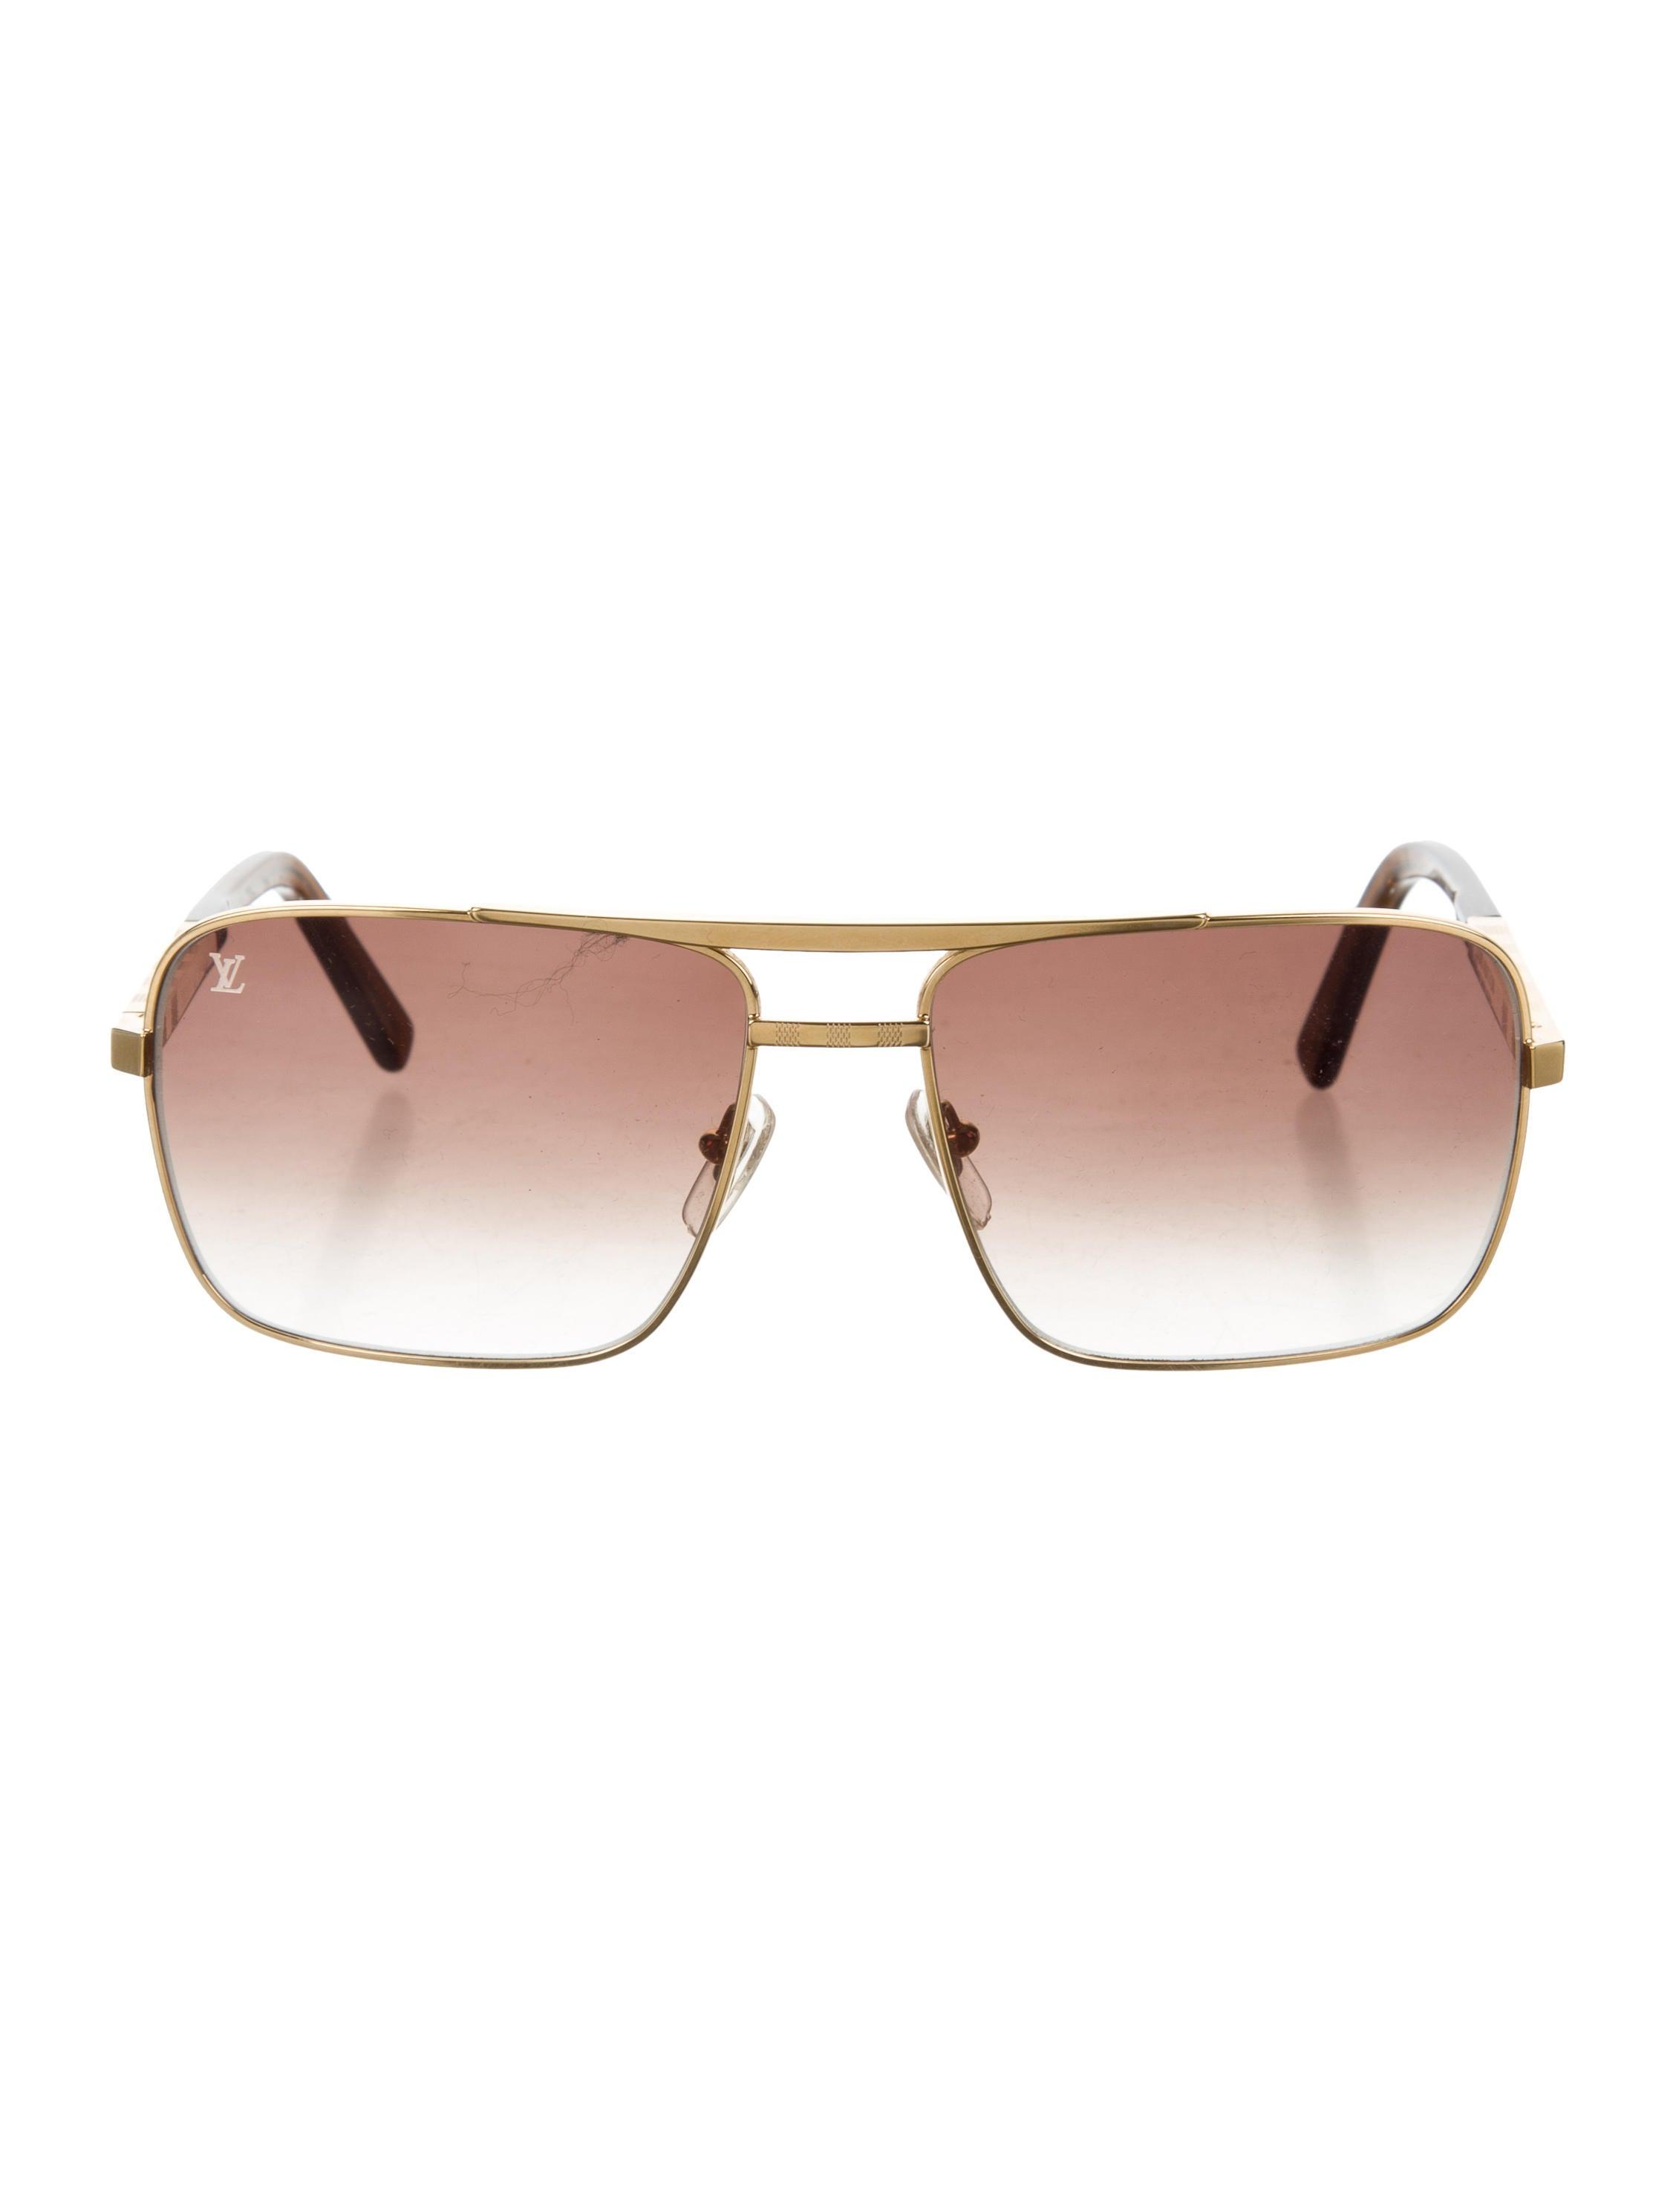 6abaf53476f Louis Vuitton Mens Sunglasses Attitude